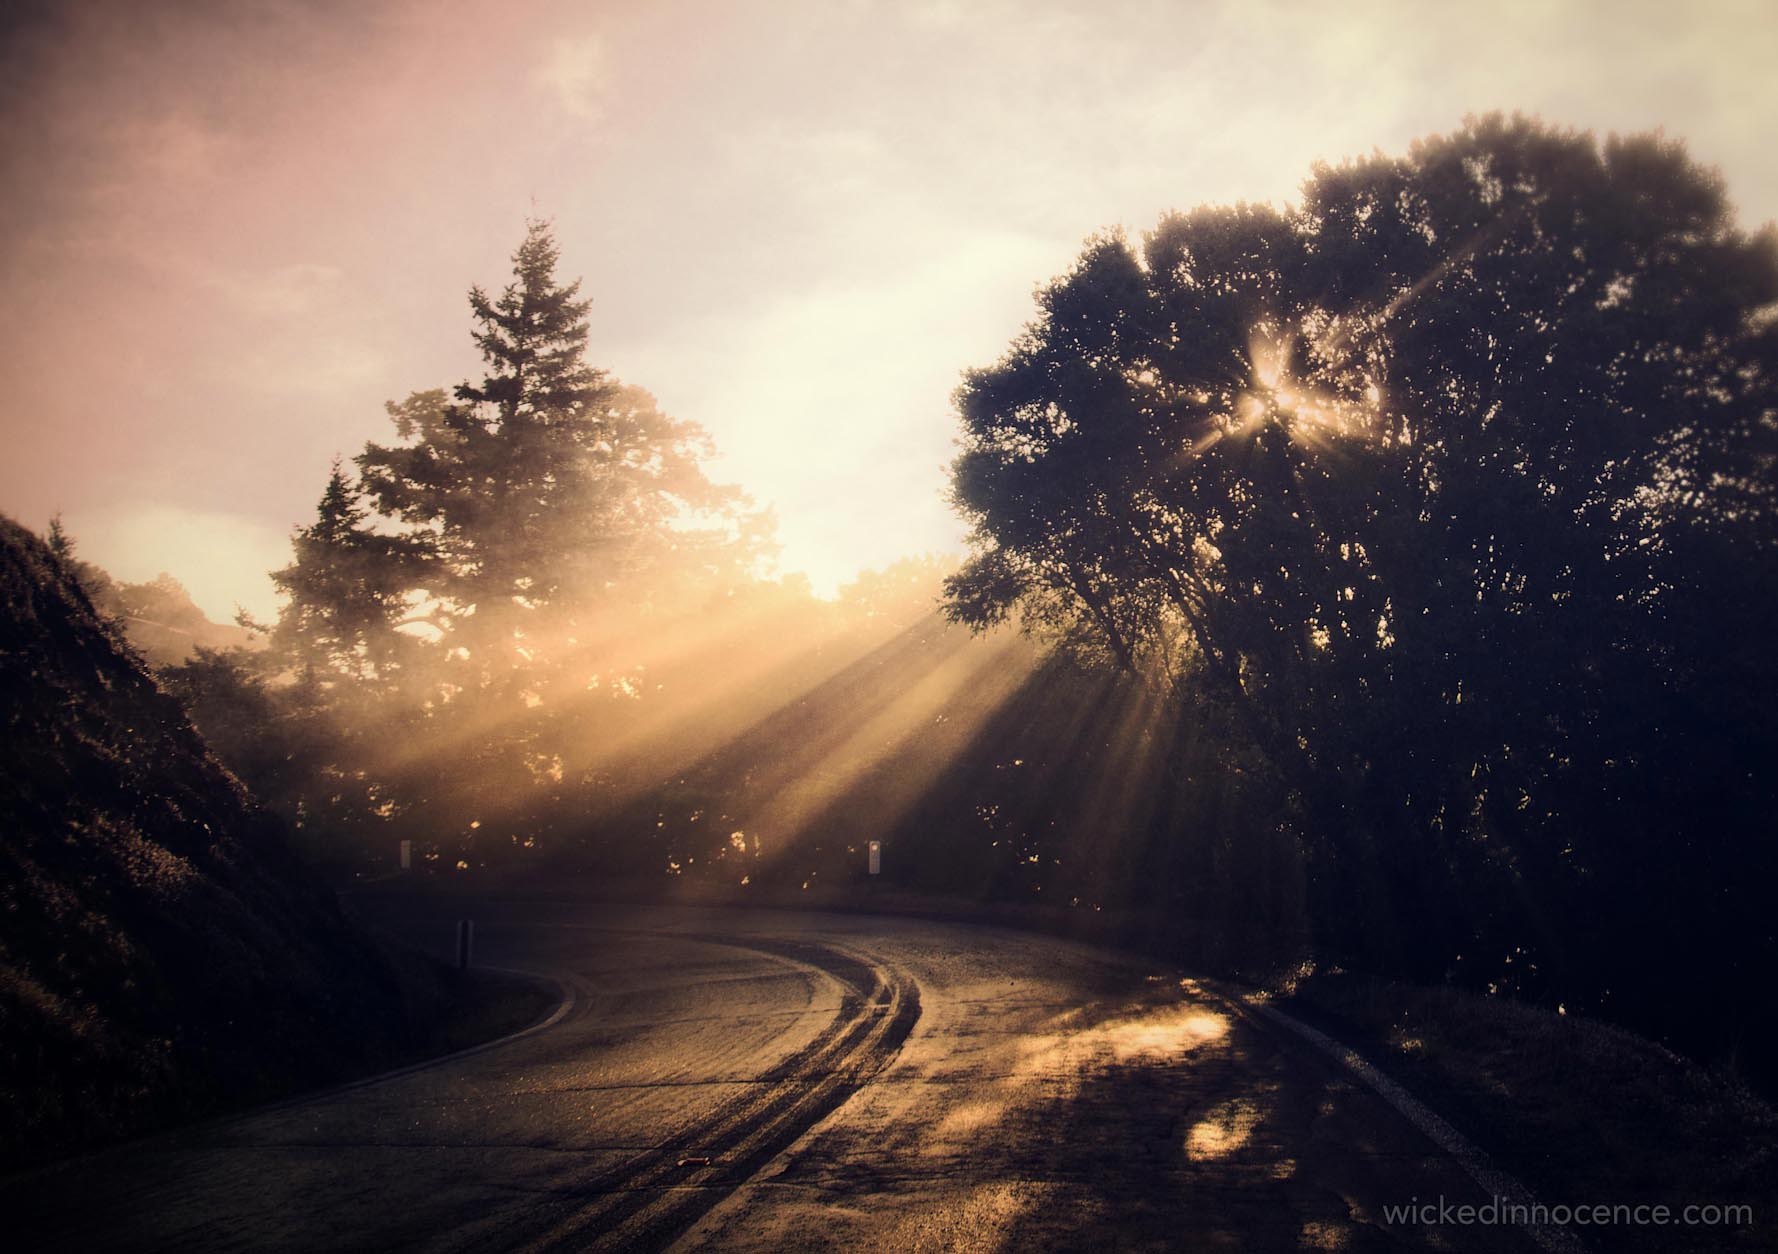 Sunlit Darkness